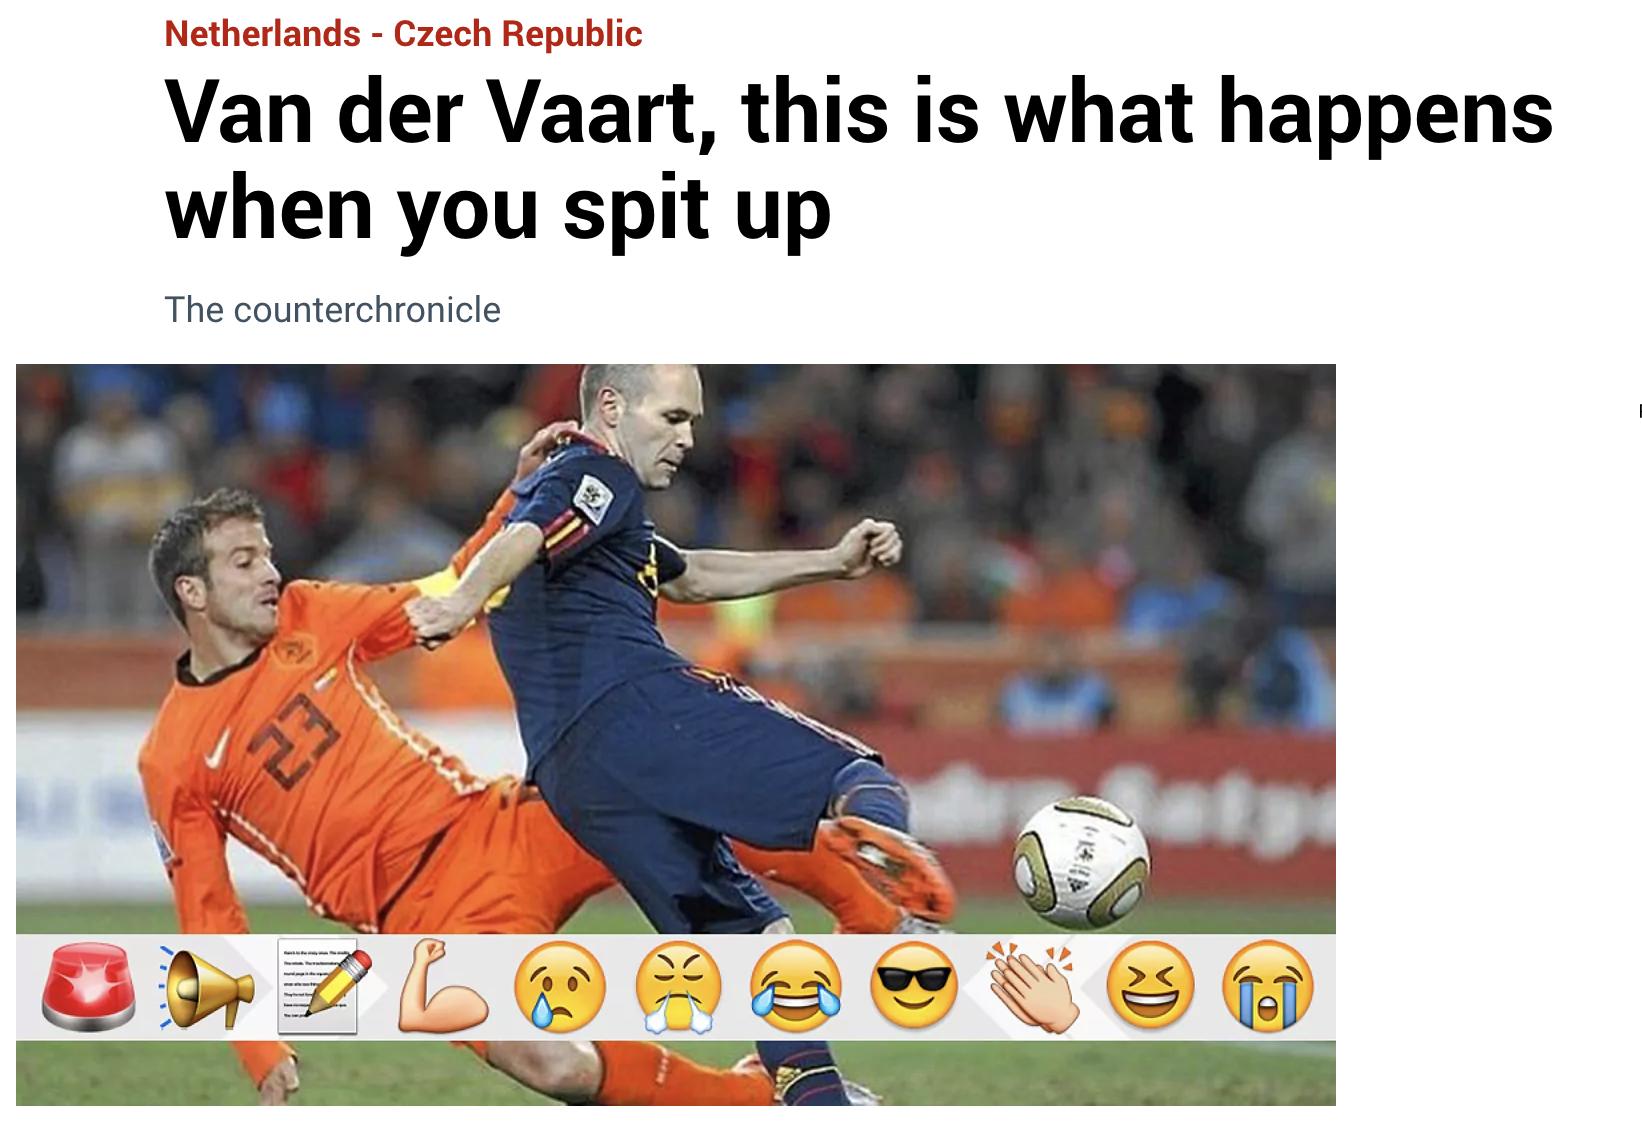 Van der Vaart, inilah yang terjadi ketika Anda berbicara tanpa berpikir, Marca menjadi berita utama setelah kekalahan 0-2 Belanda dari Republik Ceko.  Tangkapan layar